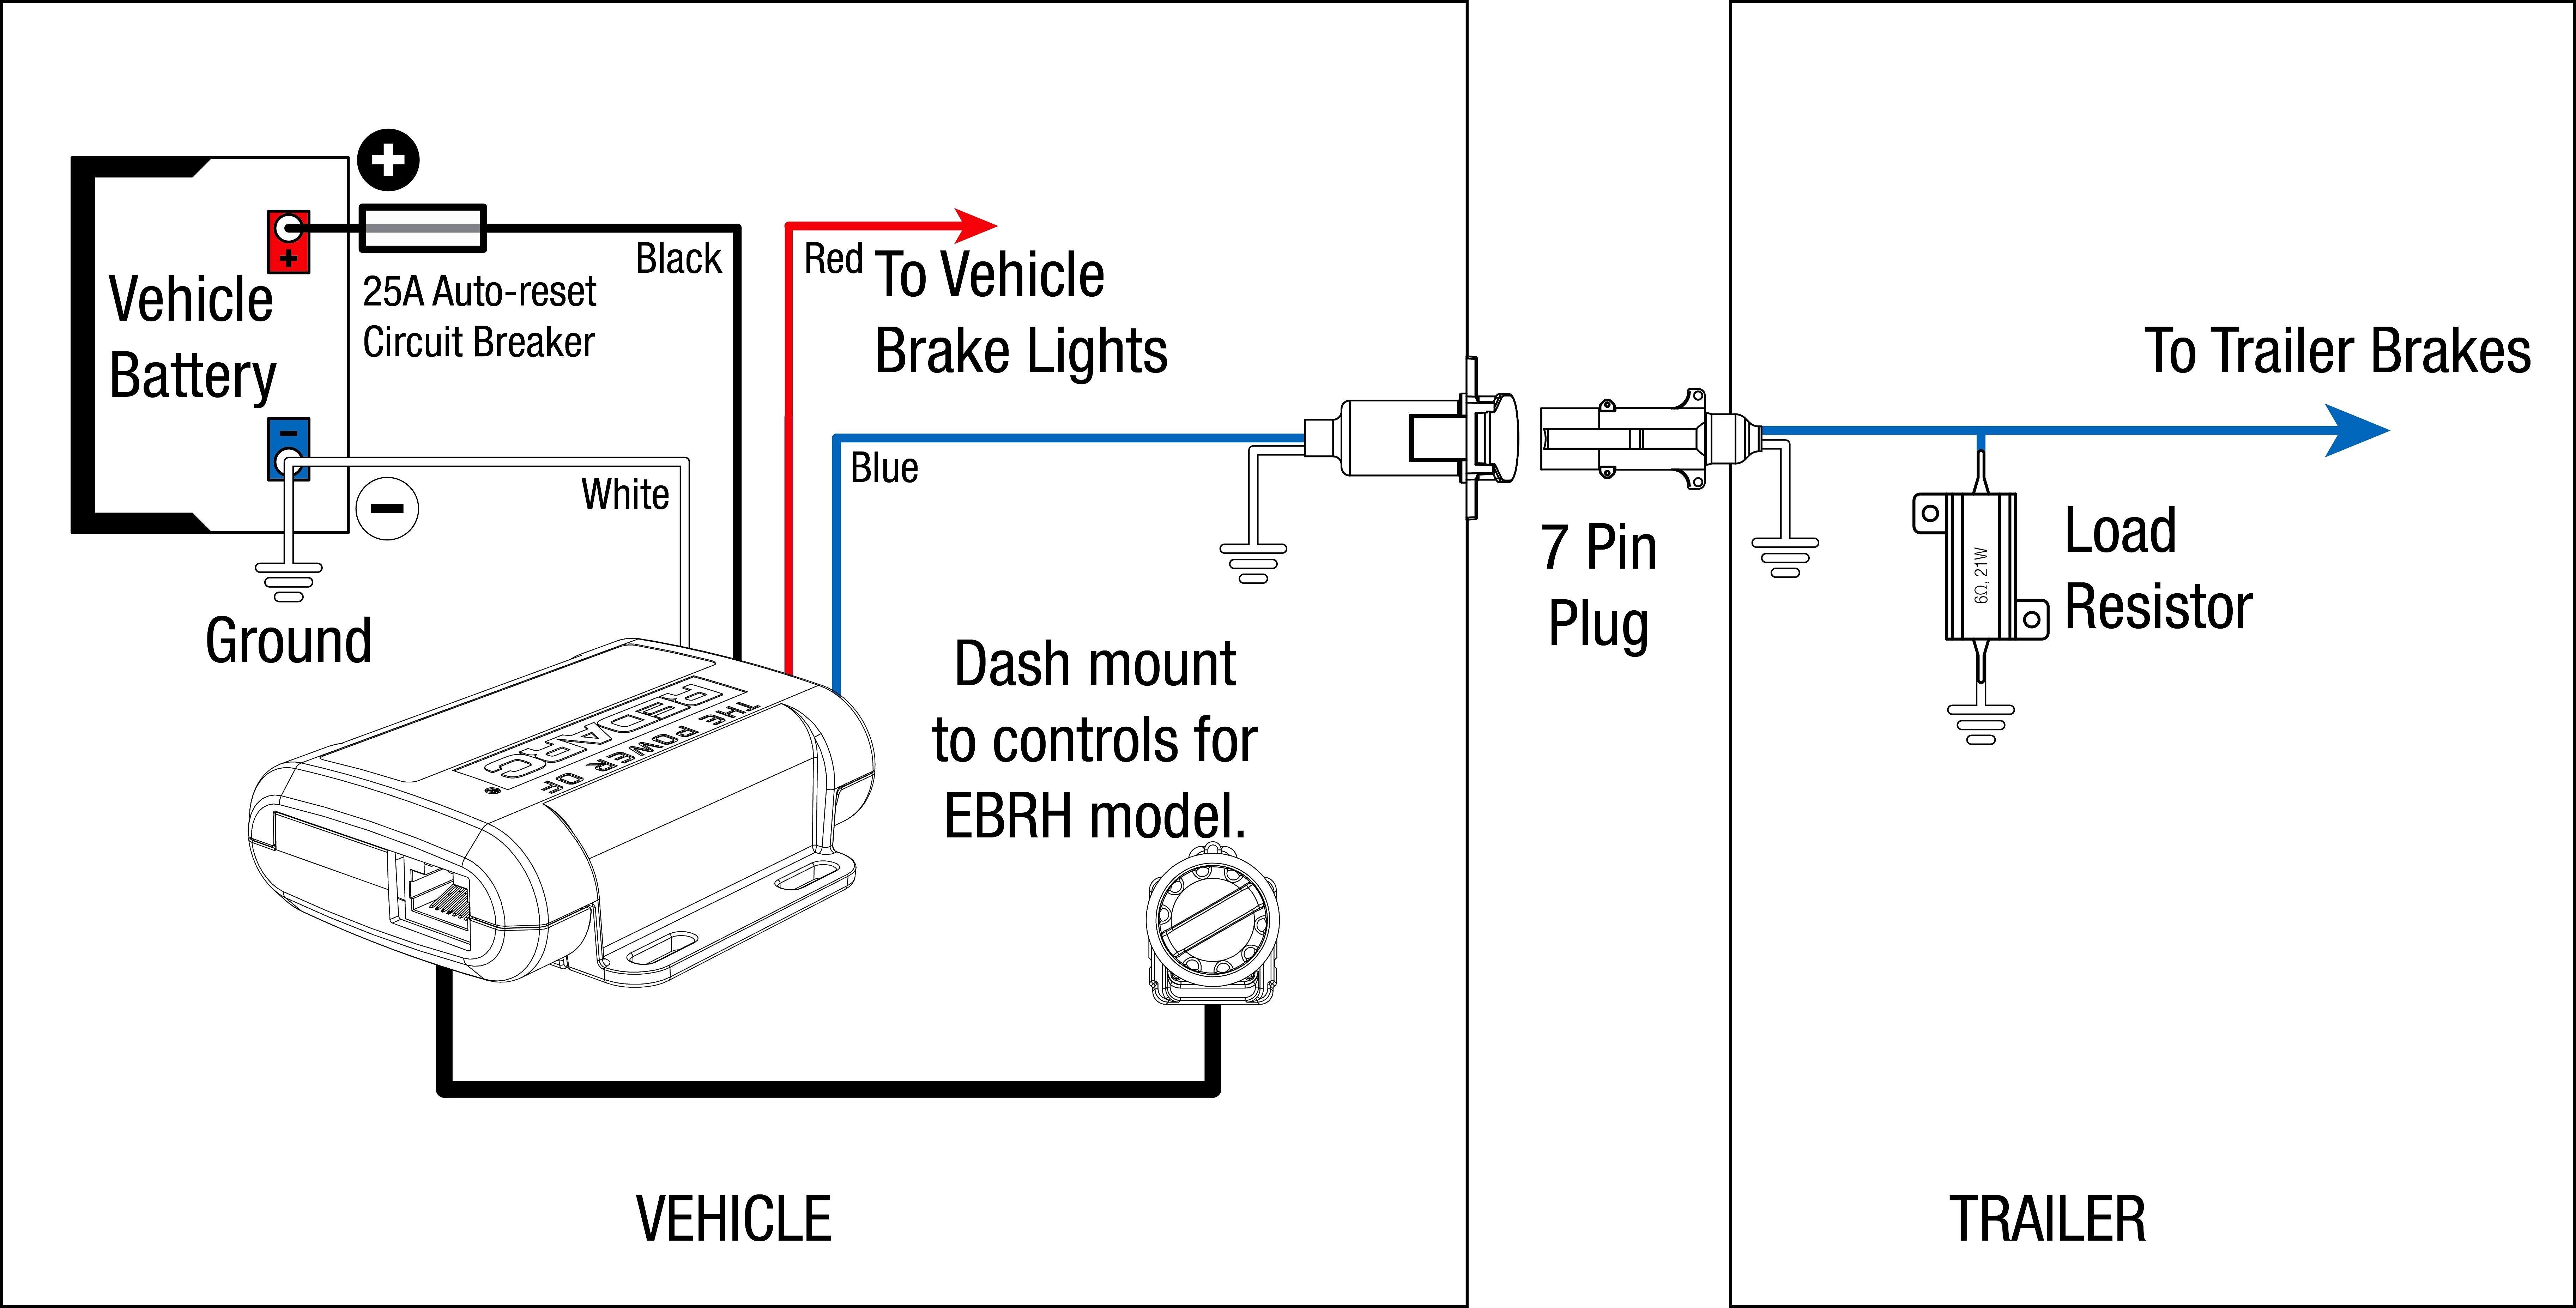 Brake Controller Wiring Diagram from mainetreasurechest.com